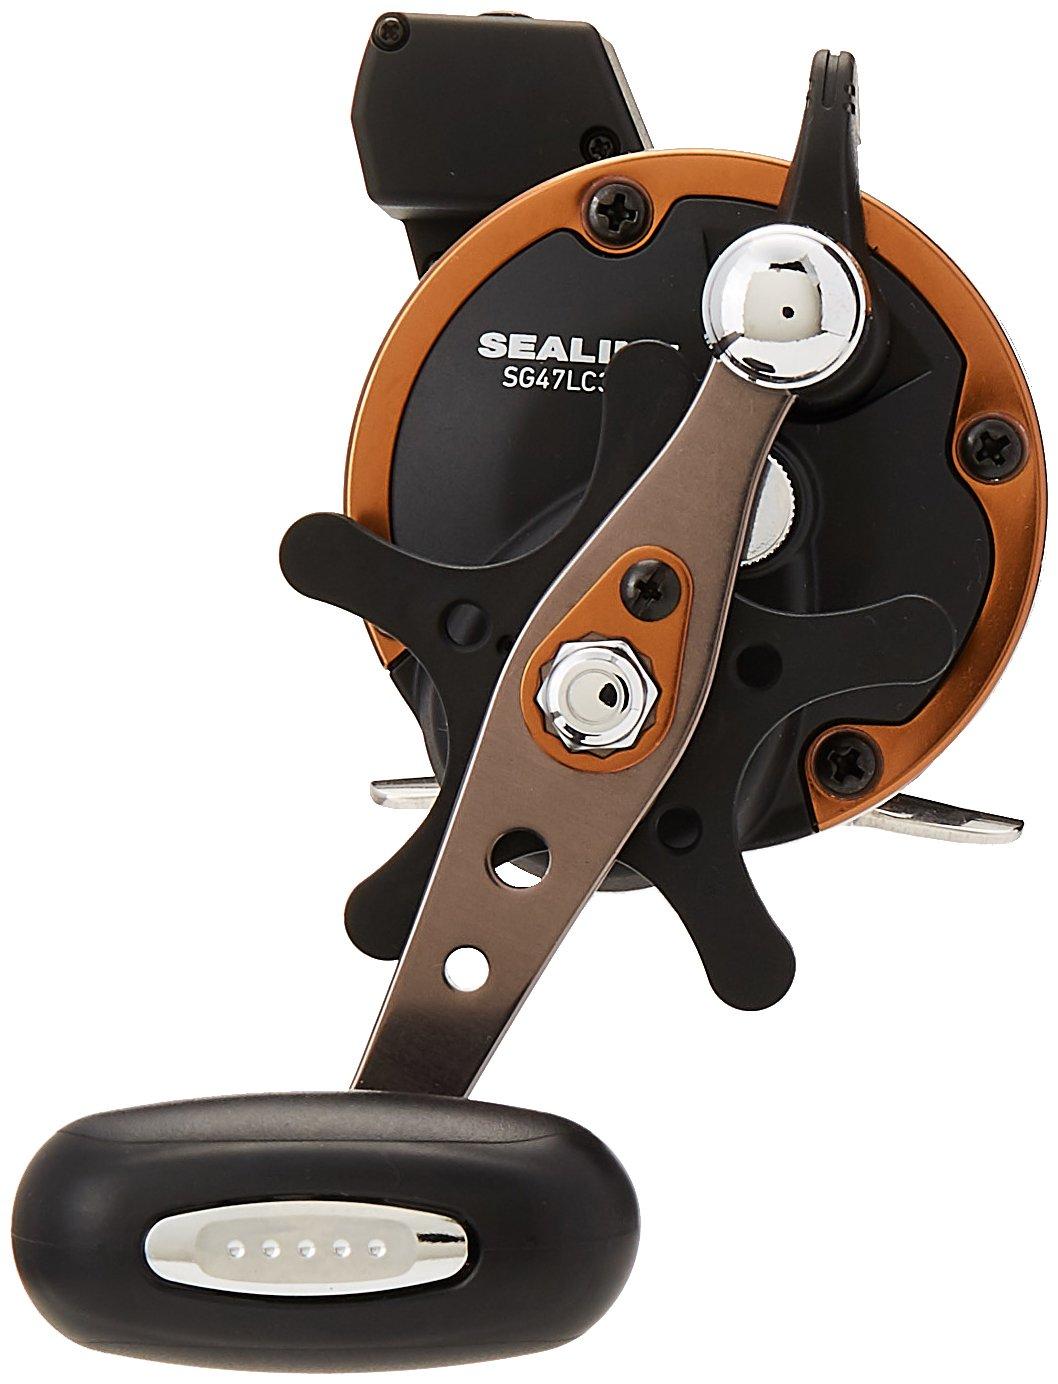 934fc35e825 Amazon.com : Daiwa Sealine SG-3B Freshwater/Saltwater Line Counter Reels :  Sports & Outdoors